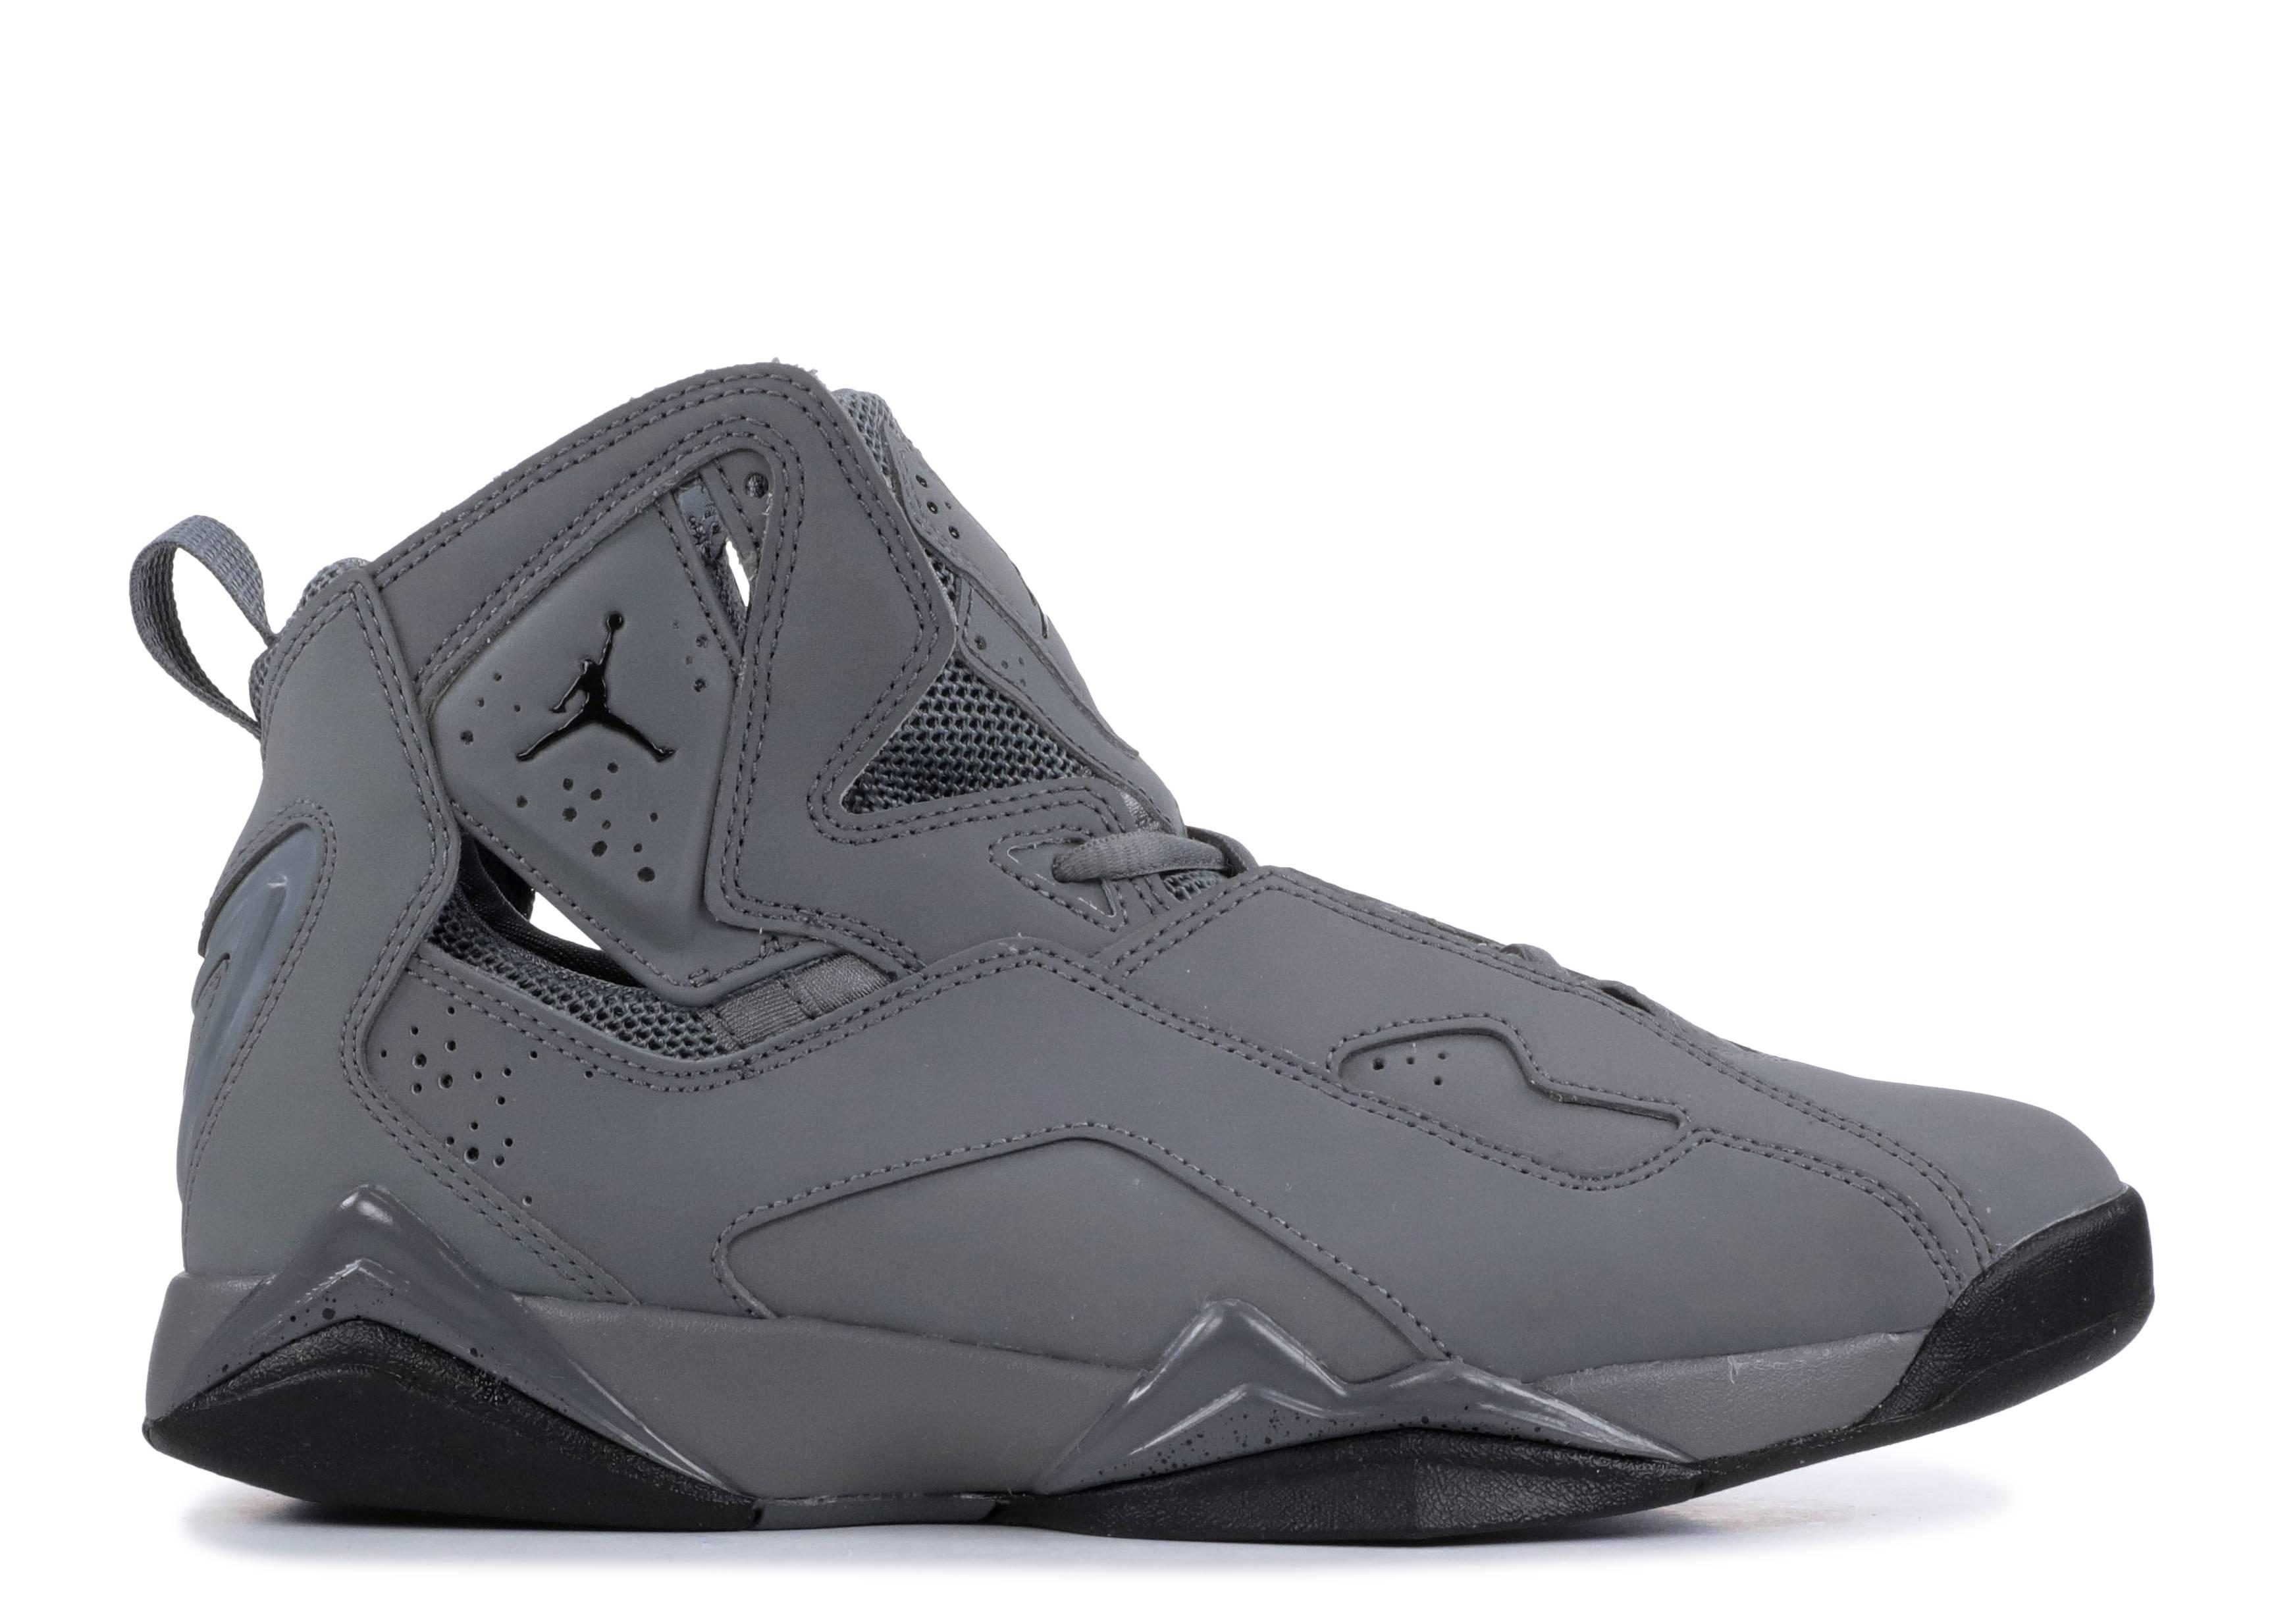 03828b988d8 Other Jordans - Air Jordans | Flight Club